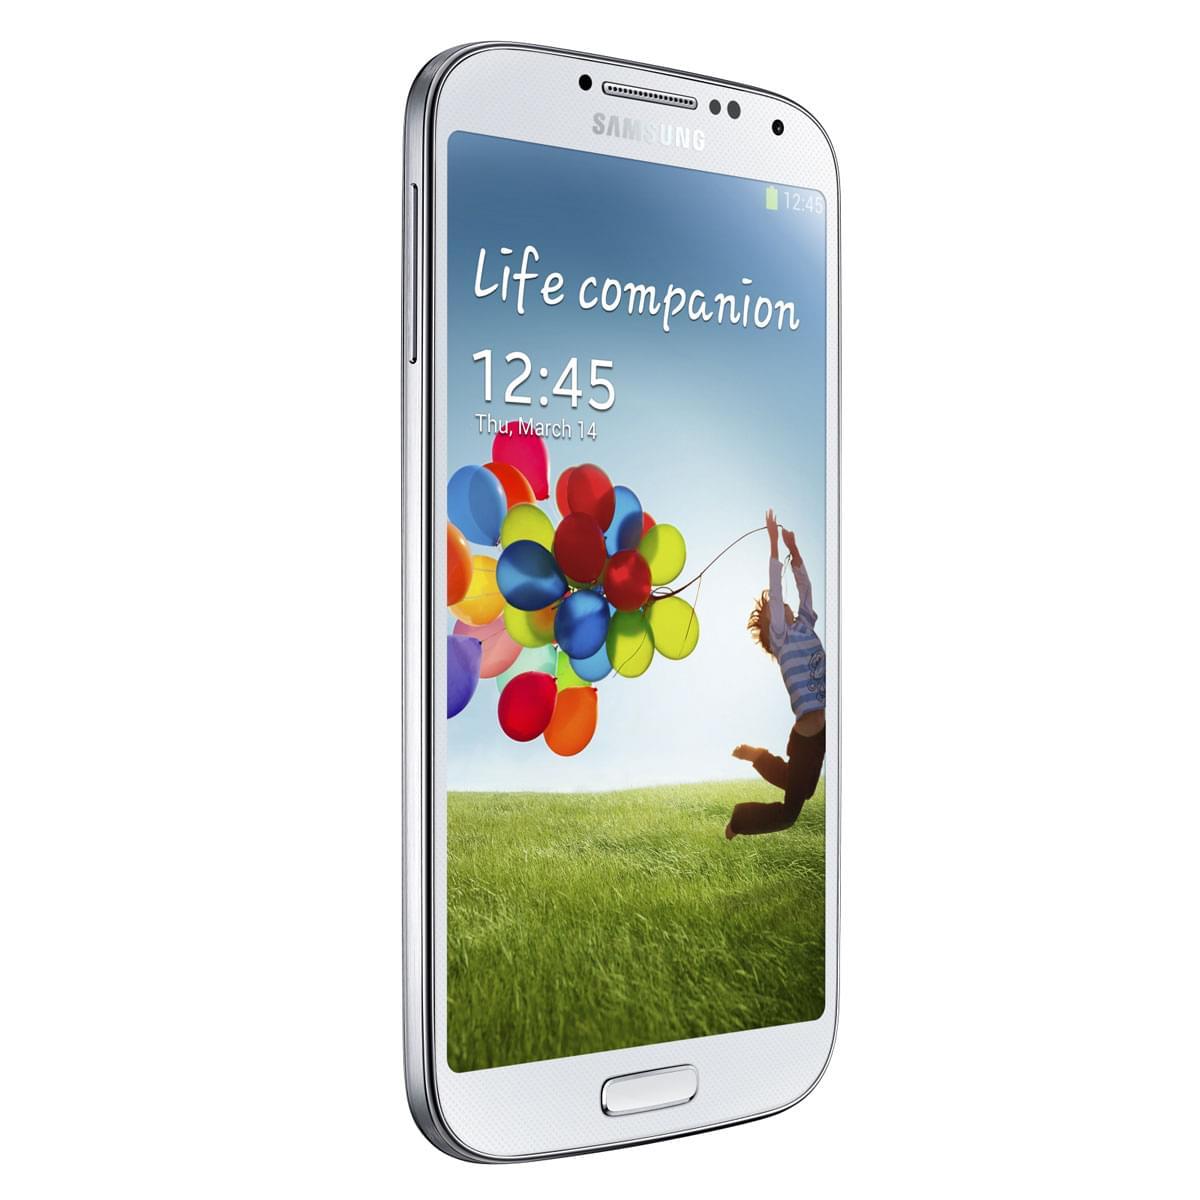 Samsung Galaxy S4 16Go GT-I9515 White Frost - Téléphonie Samsung - 0